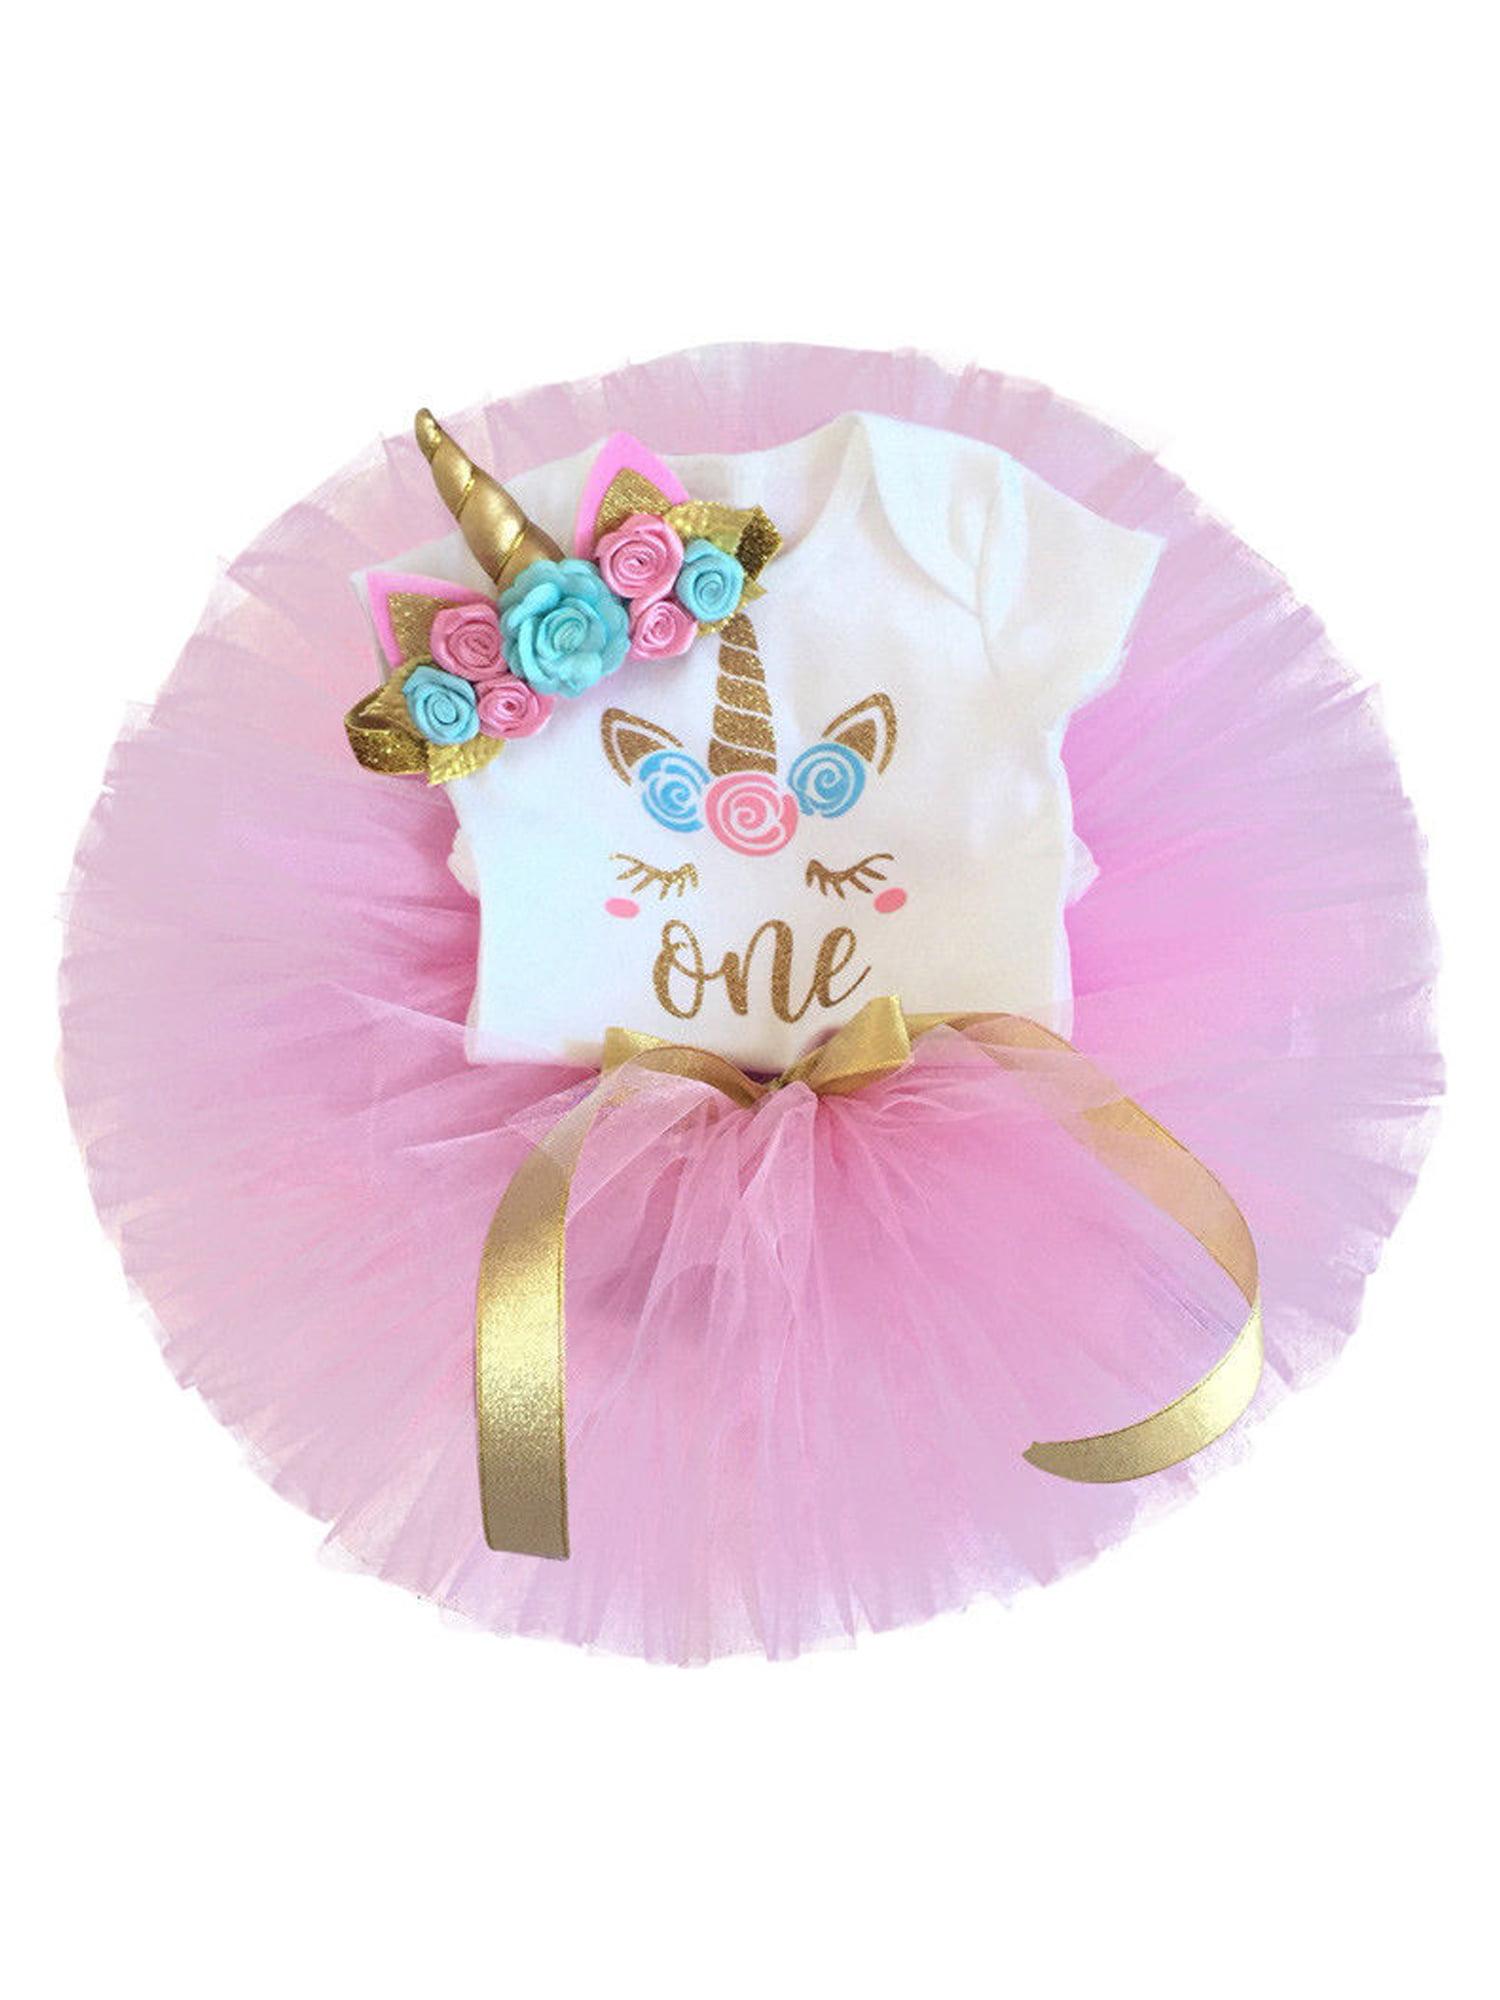 Rainbow Layered Tulle Tutu Skirt Set for Girls 3PCS Unicorn Cotton T Shirt and Headband Princess Dress up Outfits